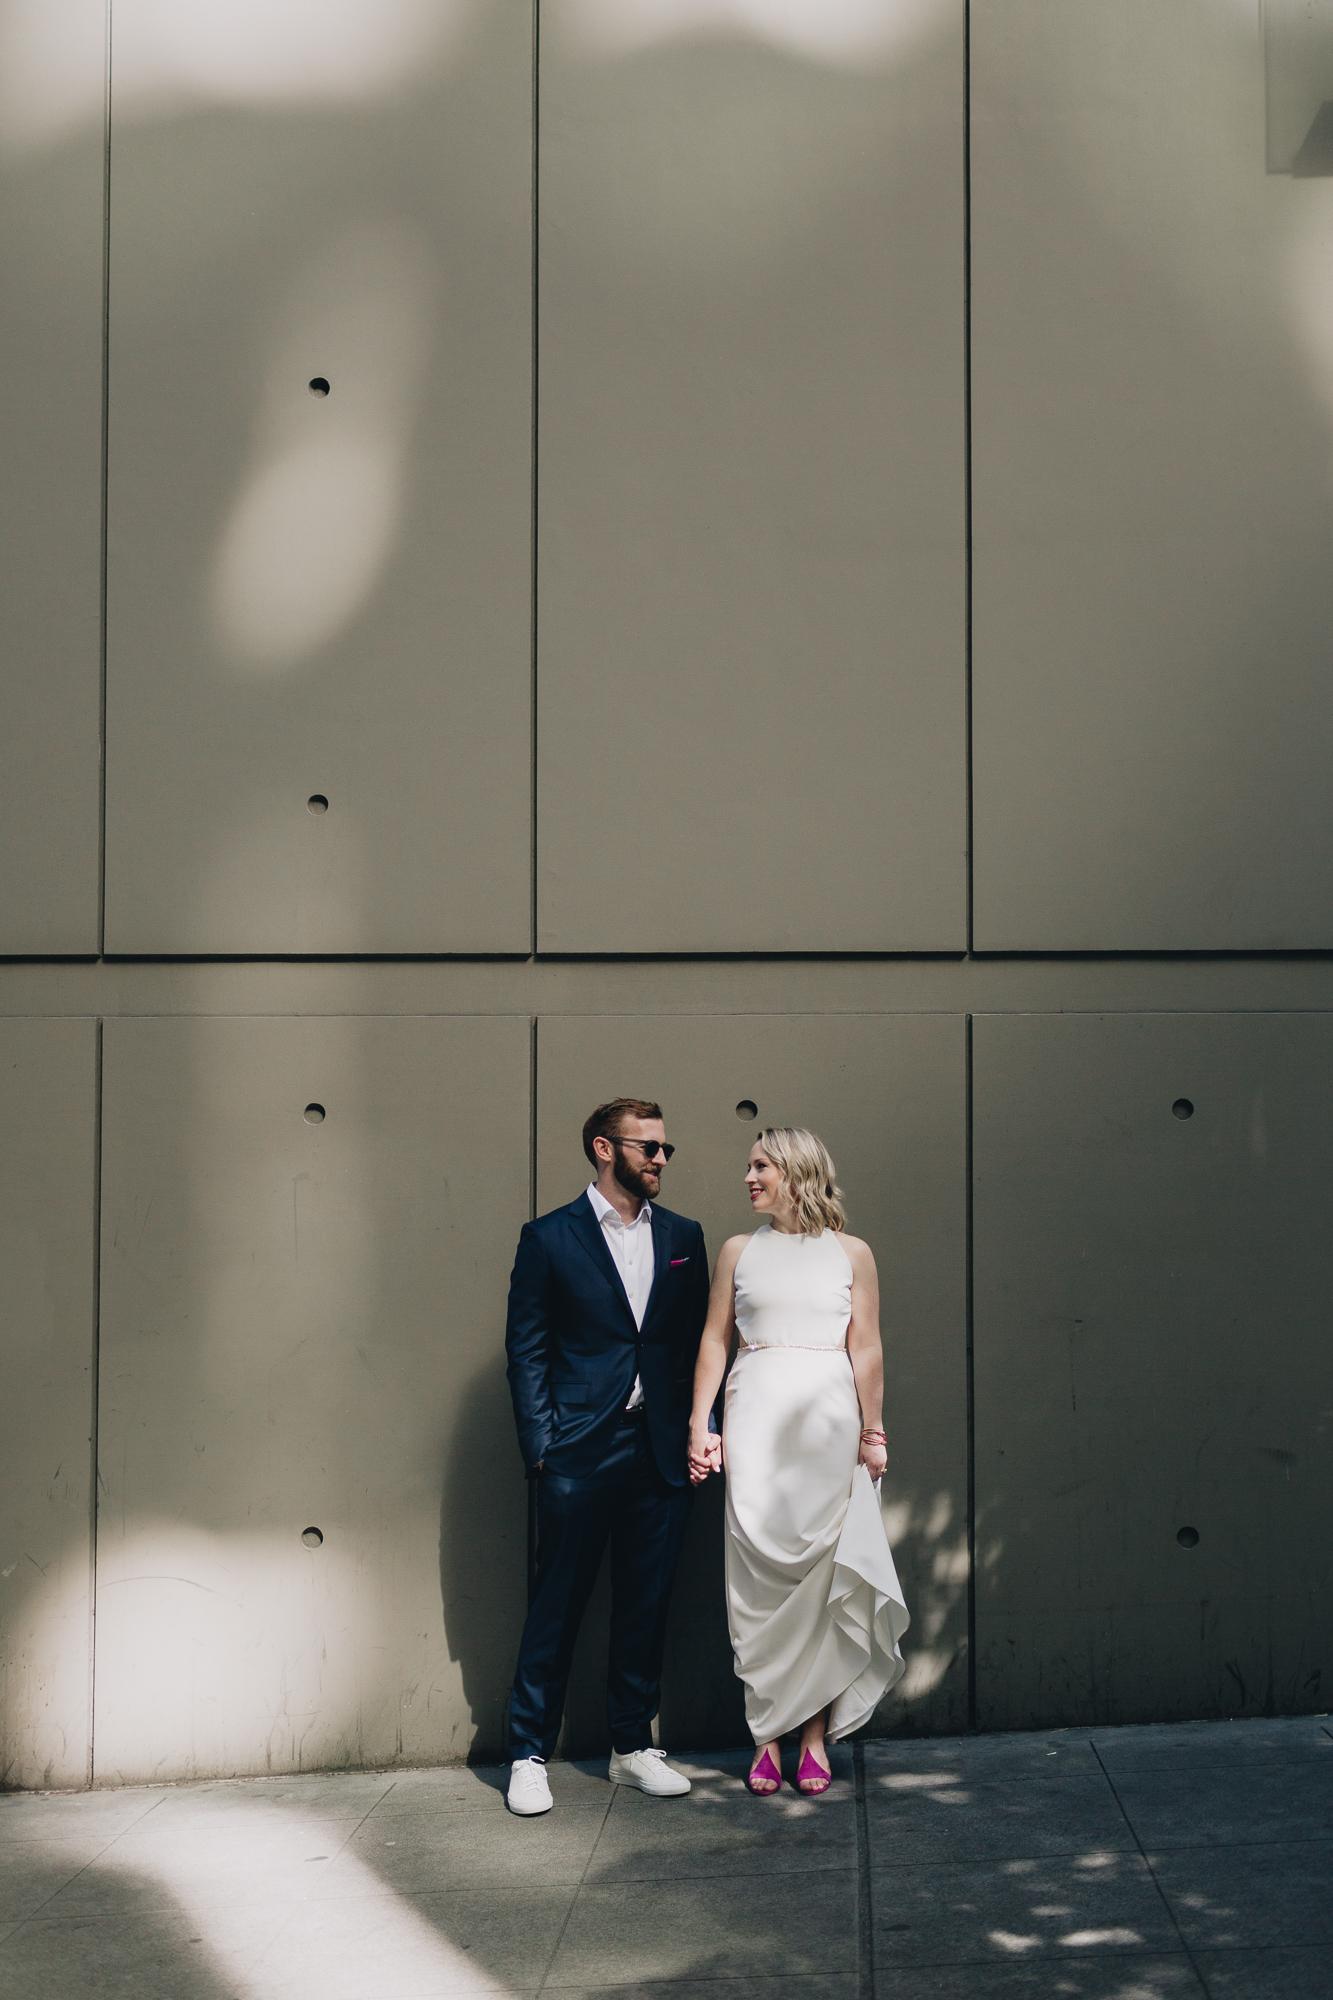 canvas event space wedding photos by Krista Welch-0018.jpg